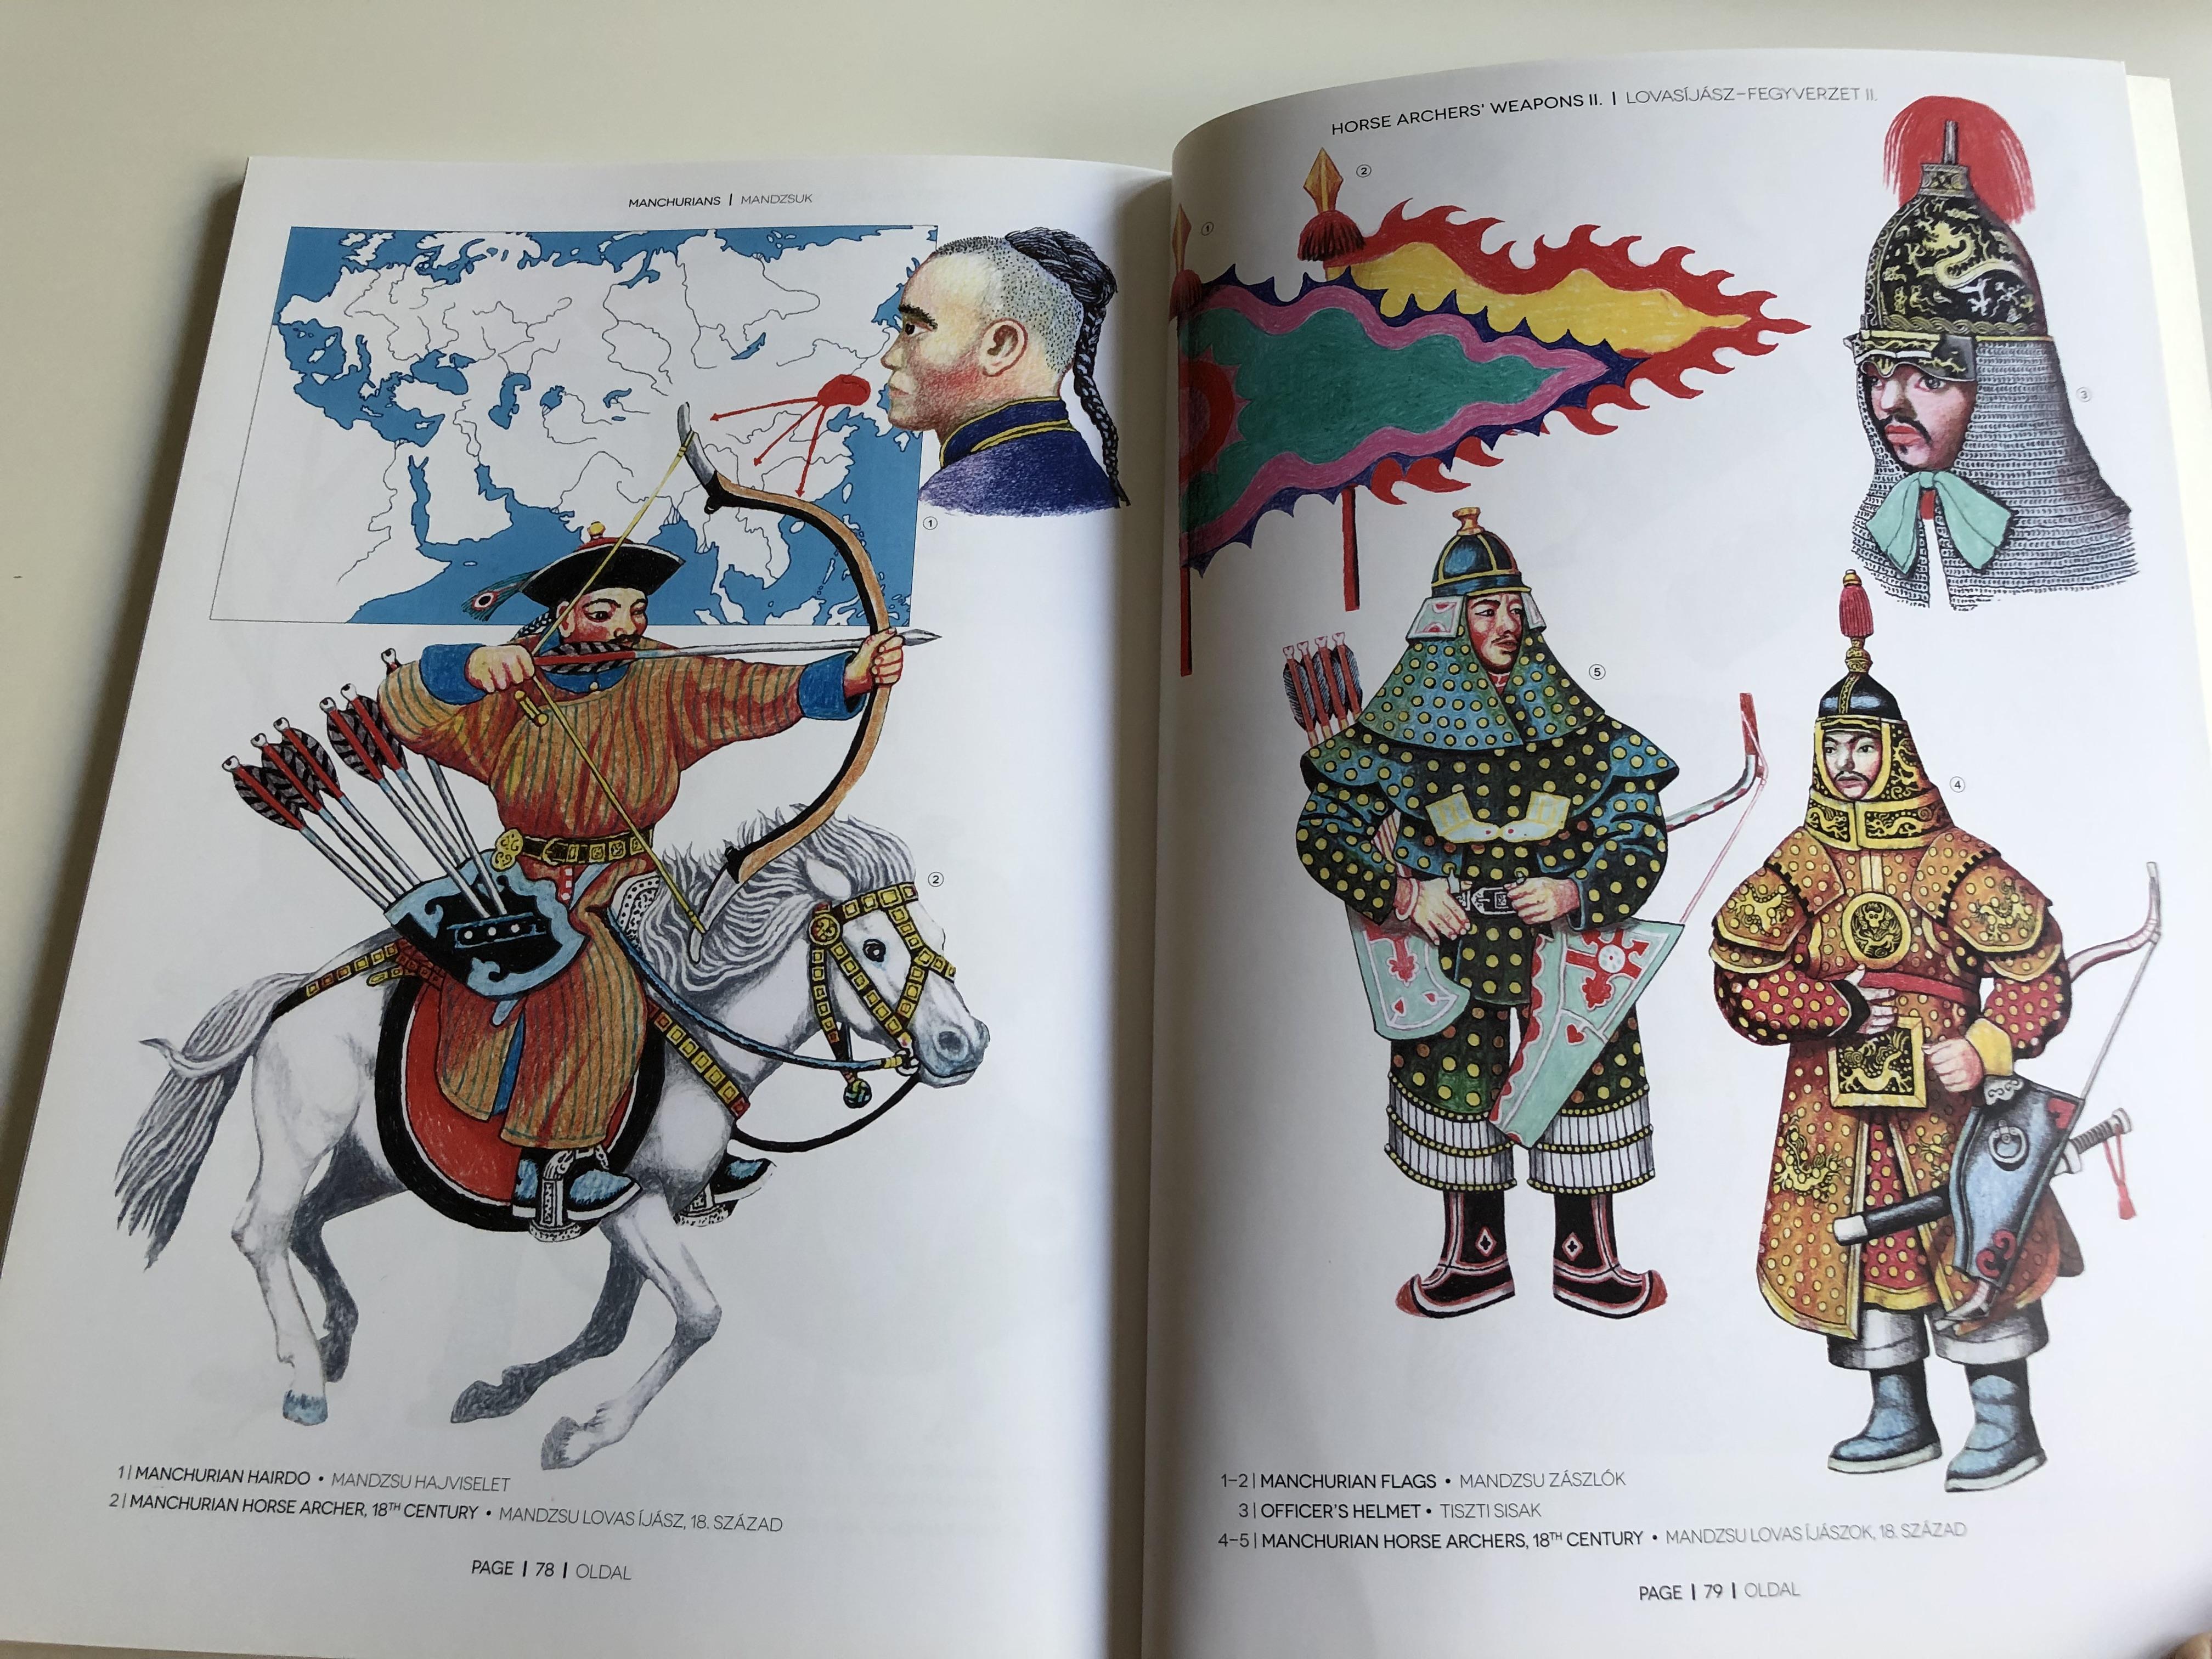 horse-archers-weapons-ii.-by-gy-z-somogyi-lovas-j-sz-fegyverzet-ii.-a-millenium-in-the-military-egy-ezred-v-hadban-paperback-2016-hm-zr-nyi-10-.jpg